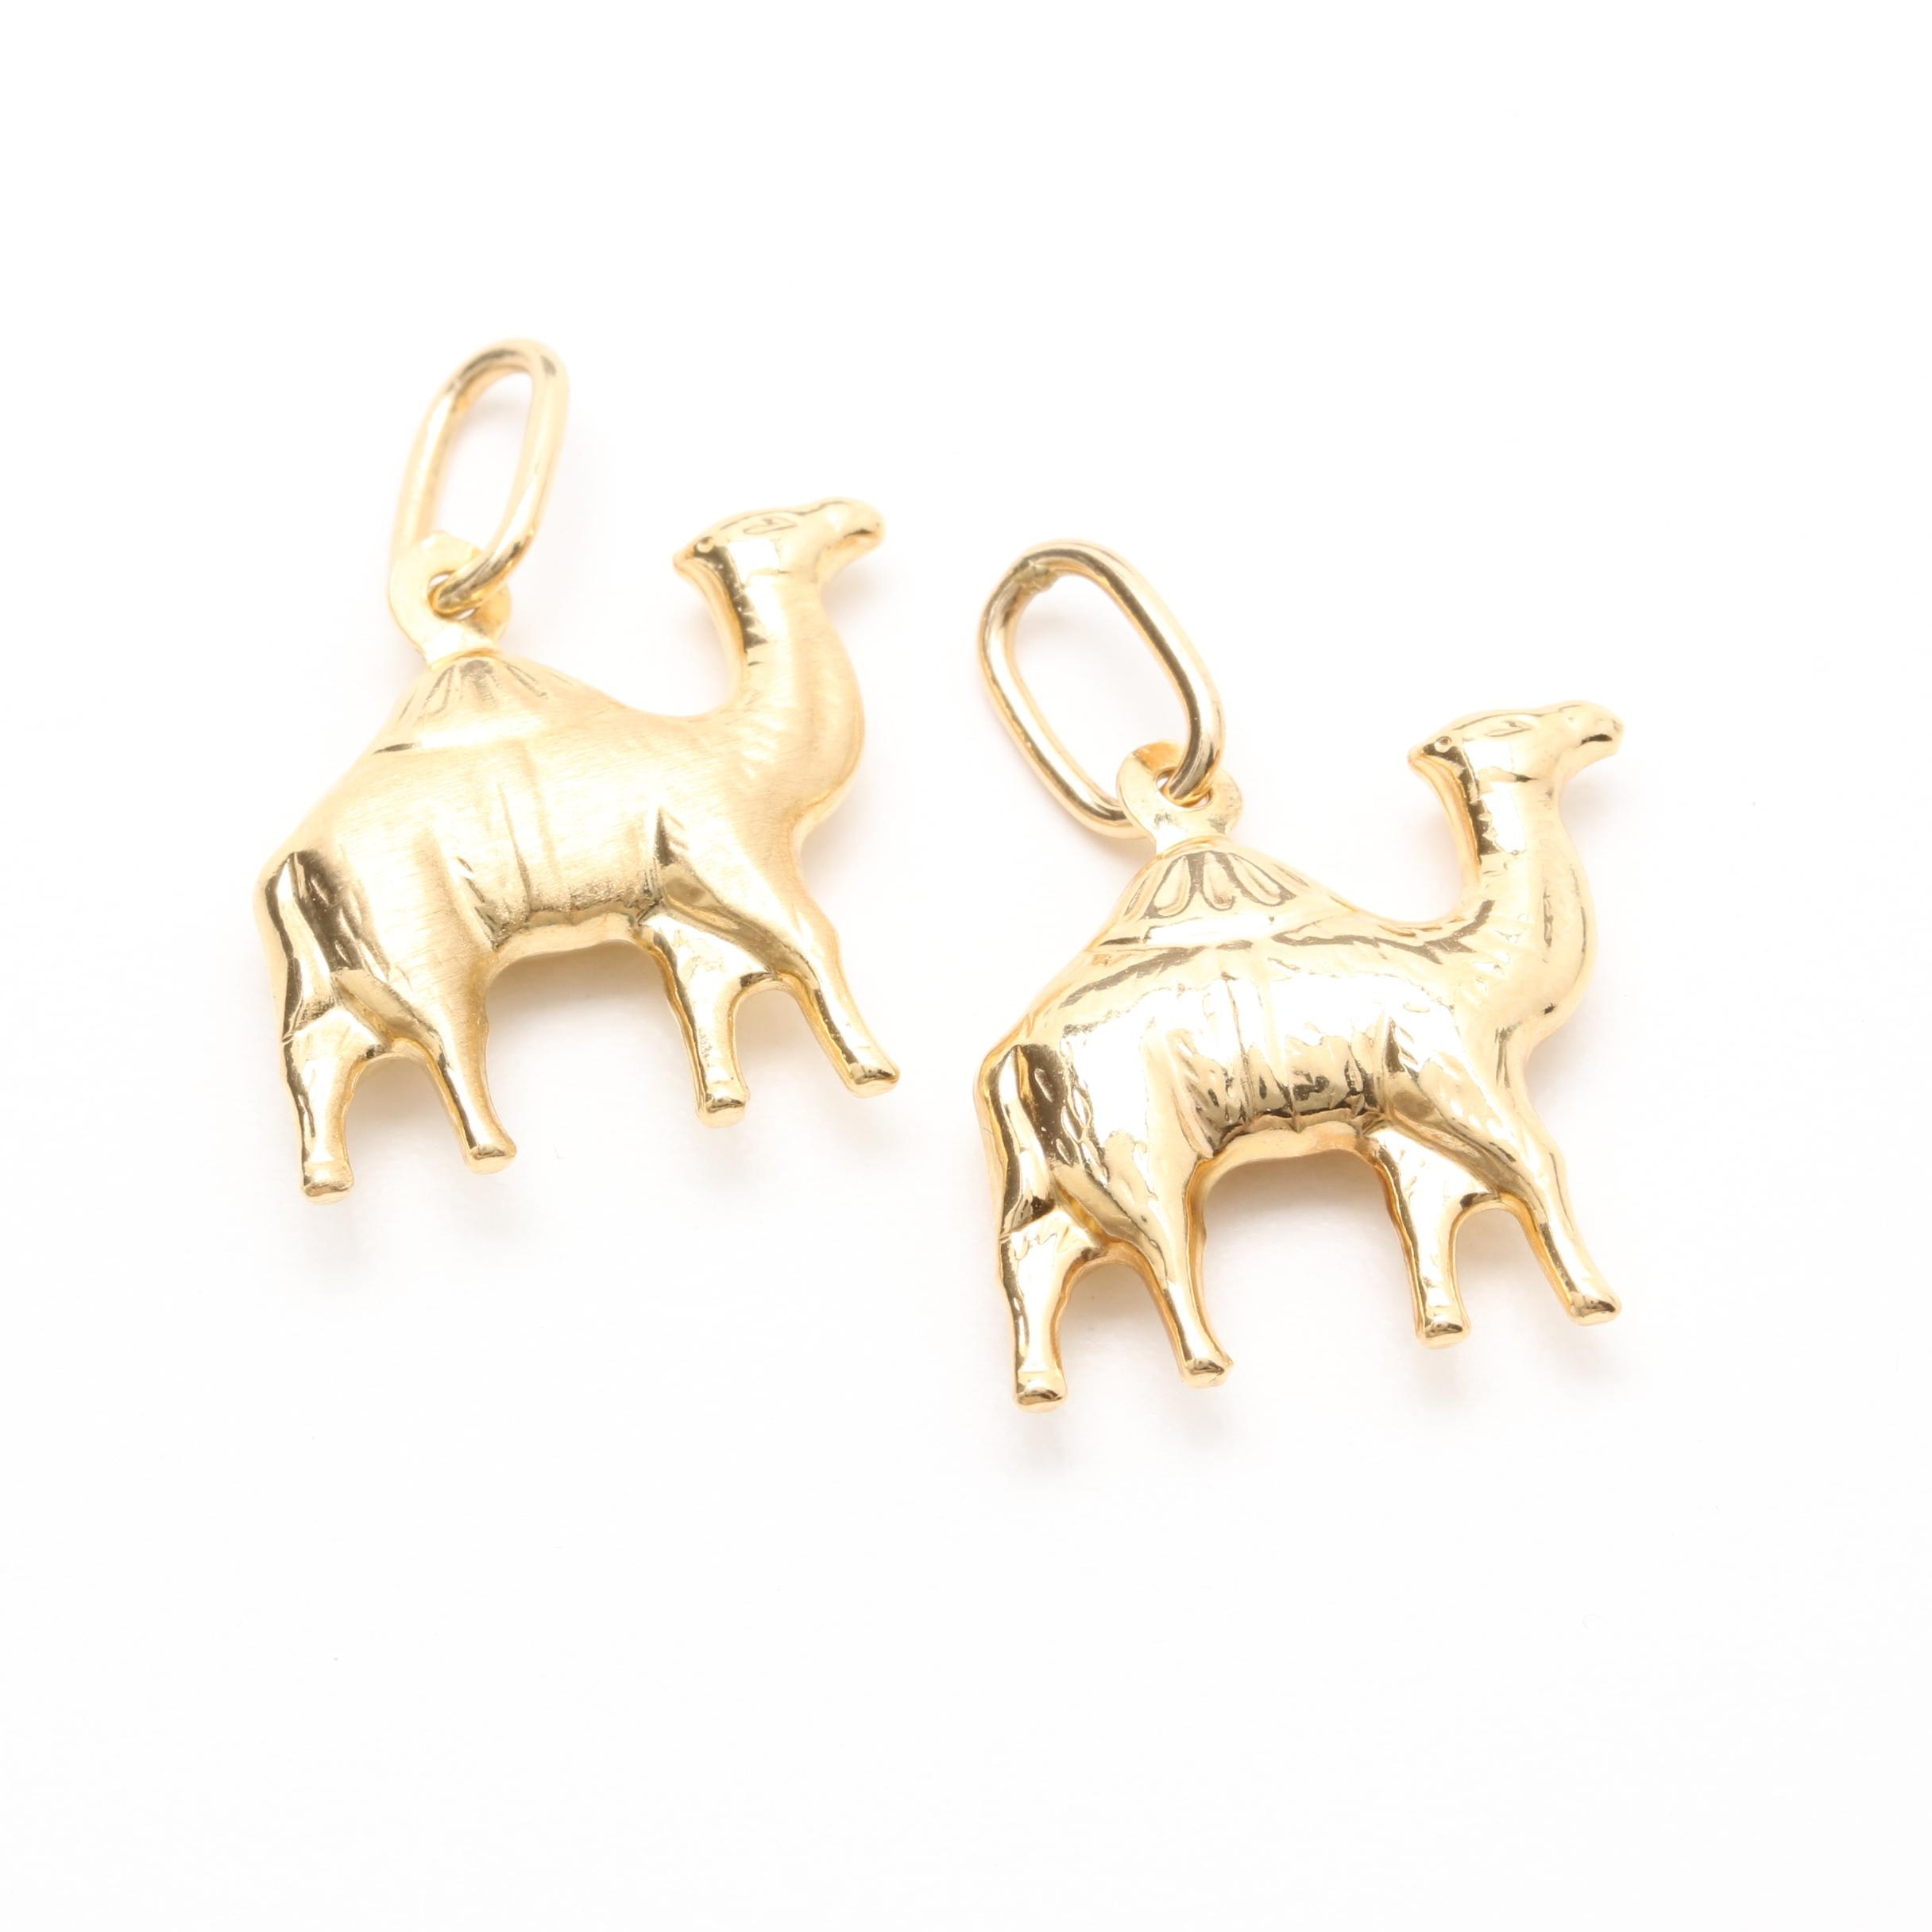 18K Yellow Gold Camel Pendants